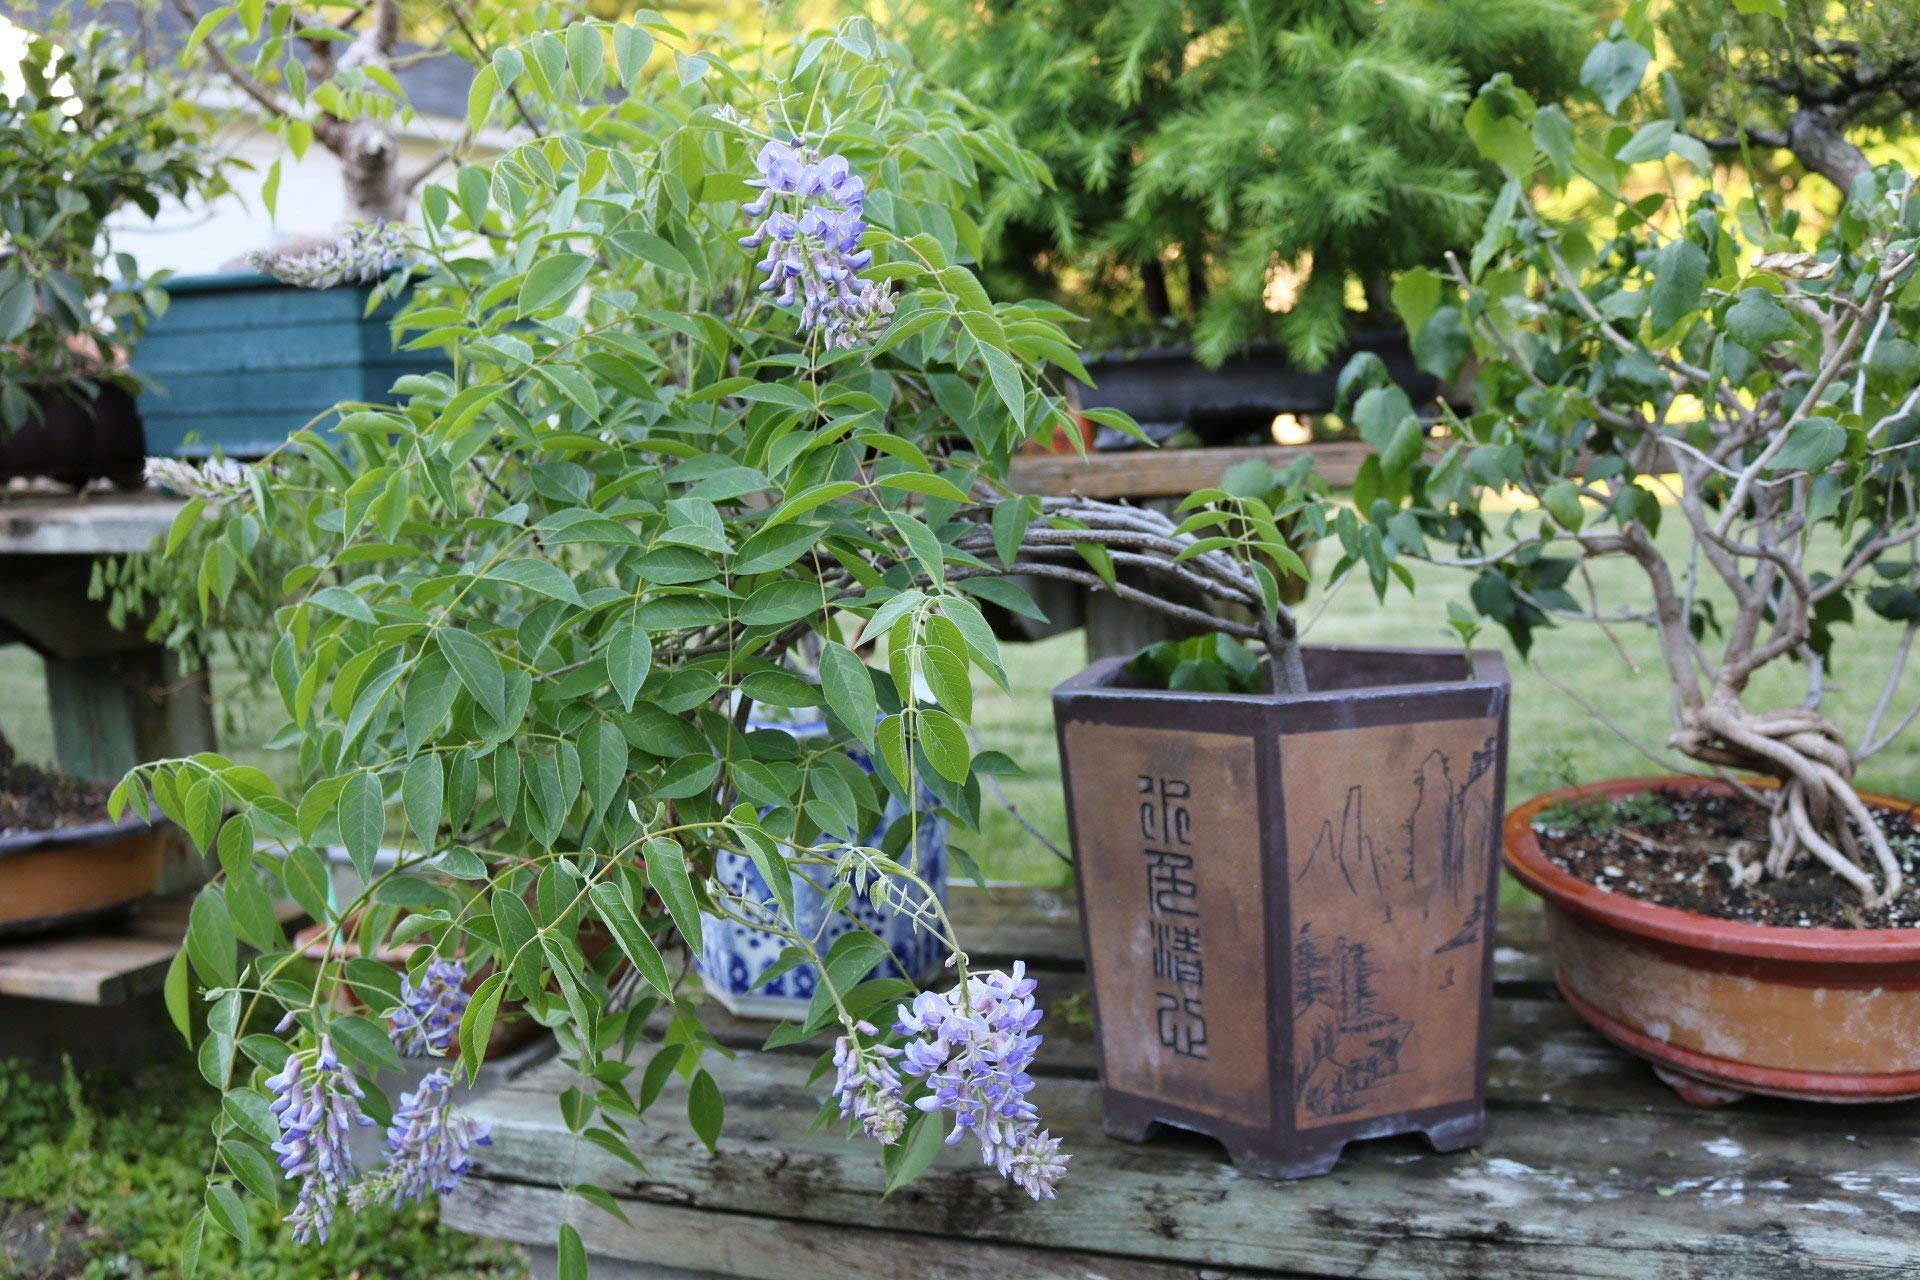 Bonsai Wisteria Tree - Amethyst Falls Wisteria Plant, Heavy Established Roots - Beautiful Flowering Bonsai Indoor Plant